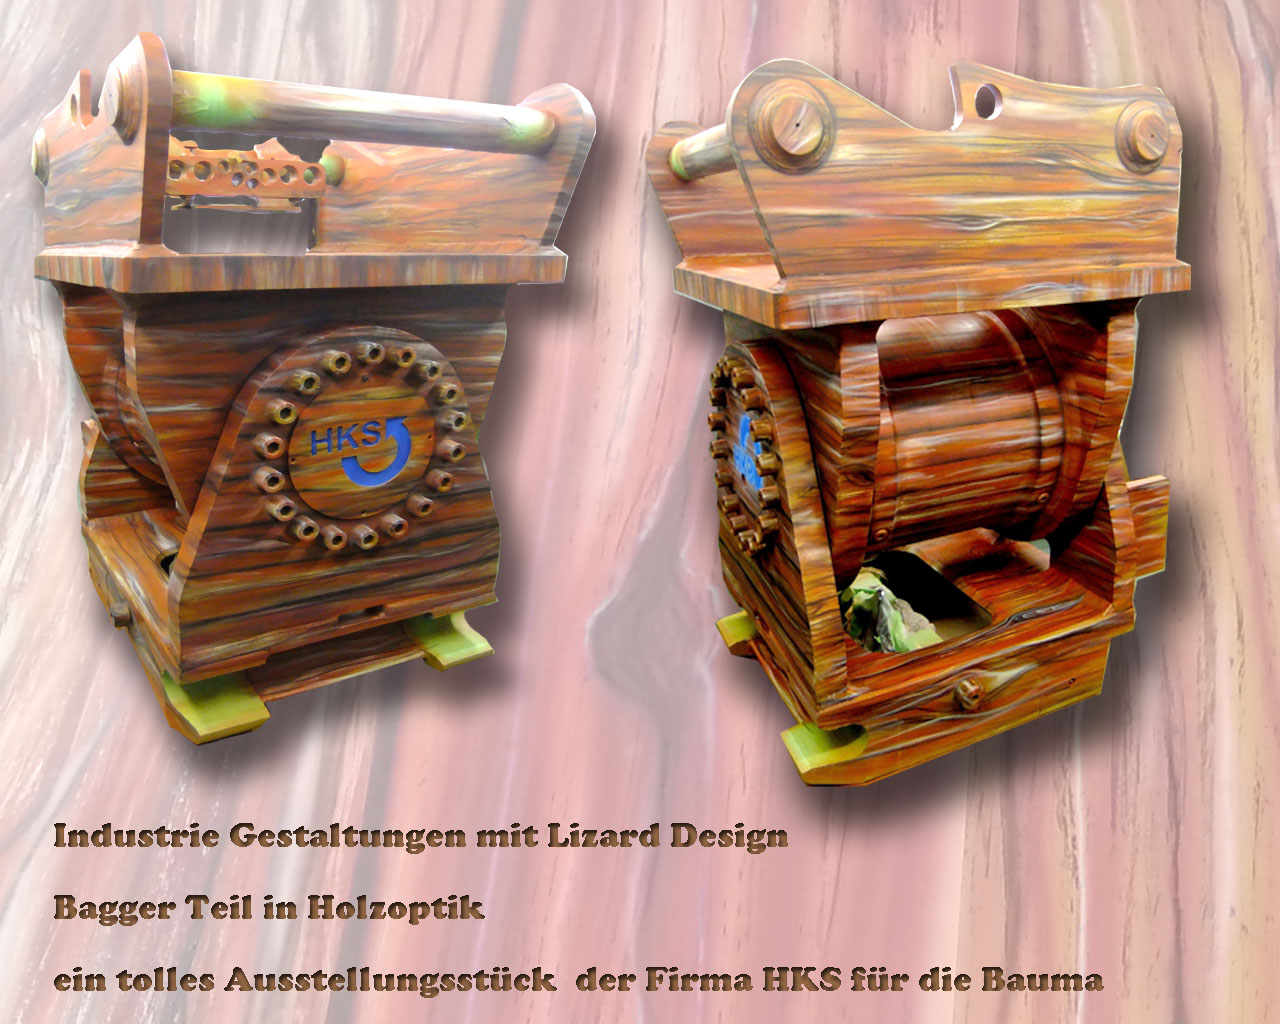 Airbrush Industrie Design